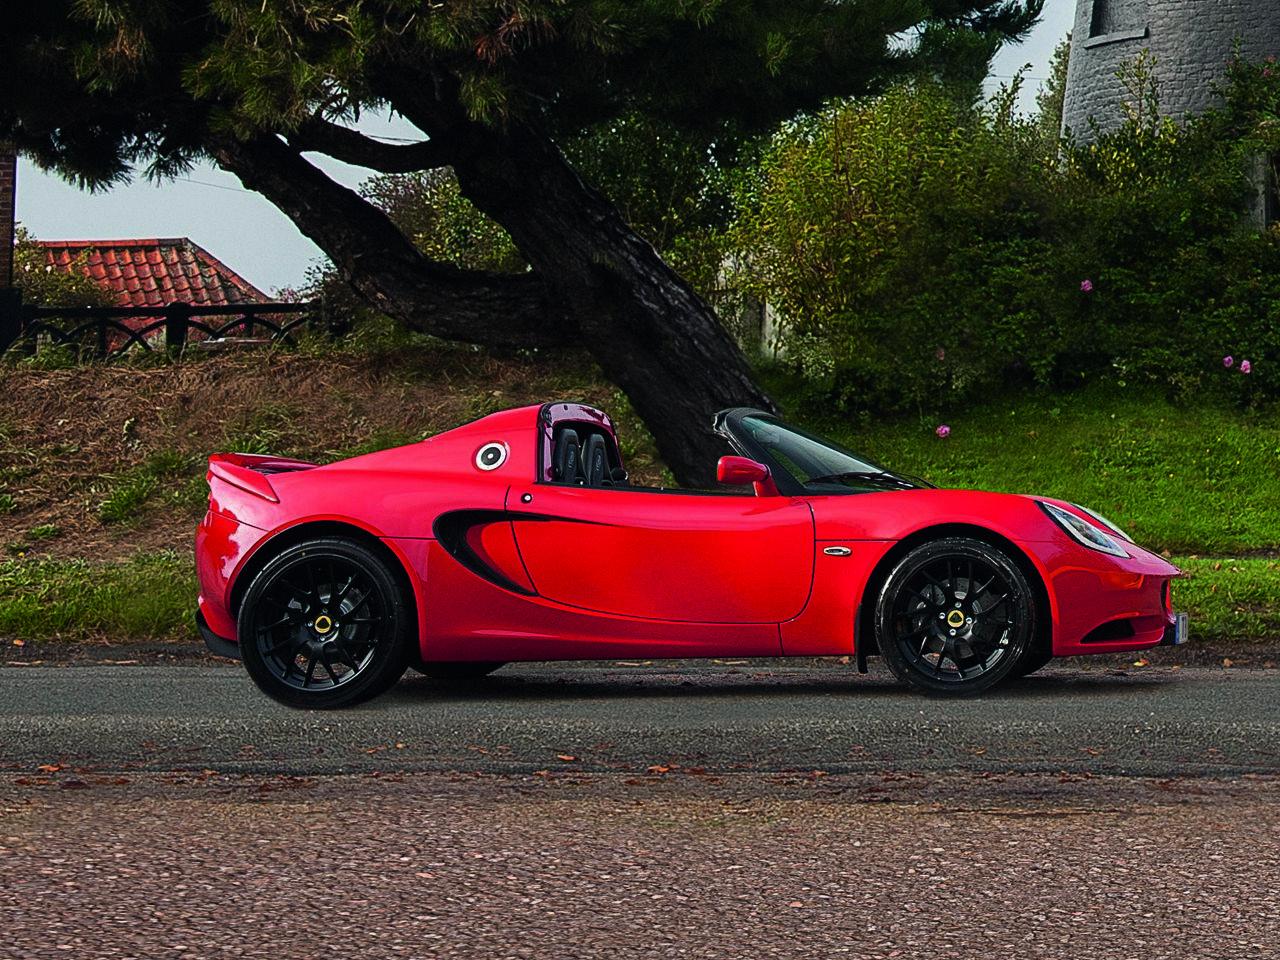 Lotus-Elise-Sport-Elise-Sport-220-prezzo-price_0-100_13